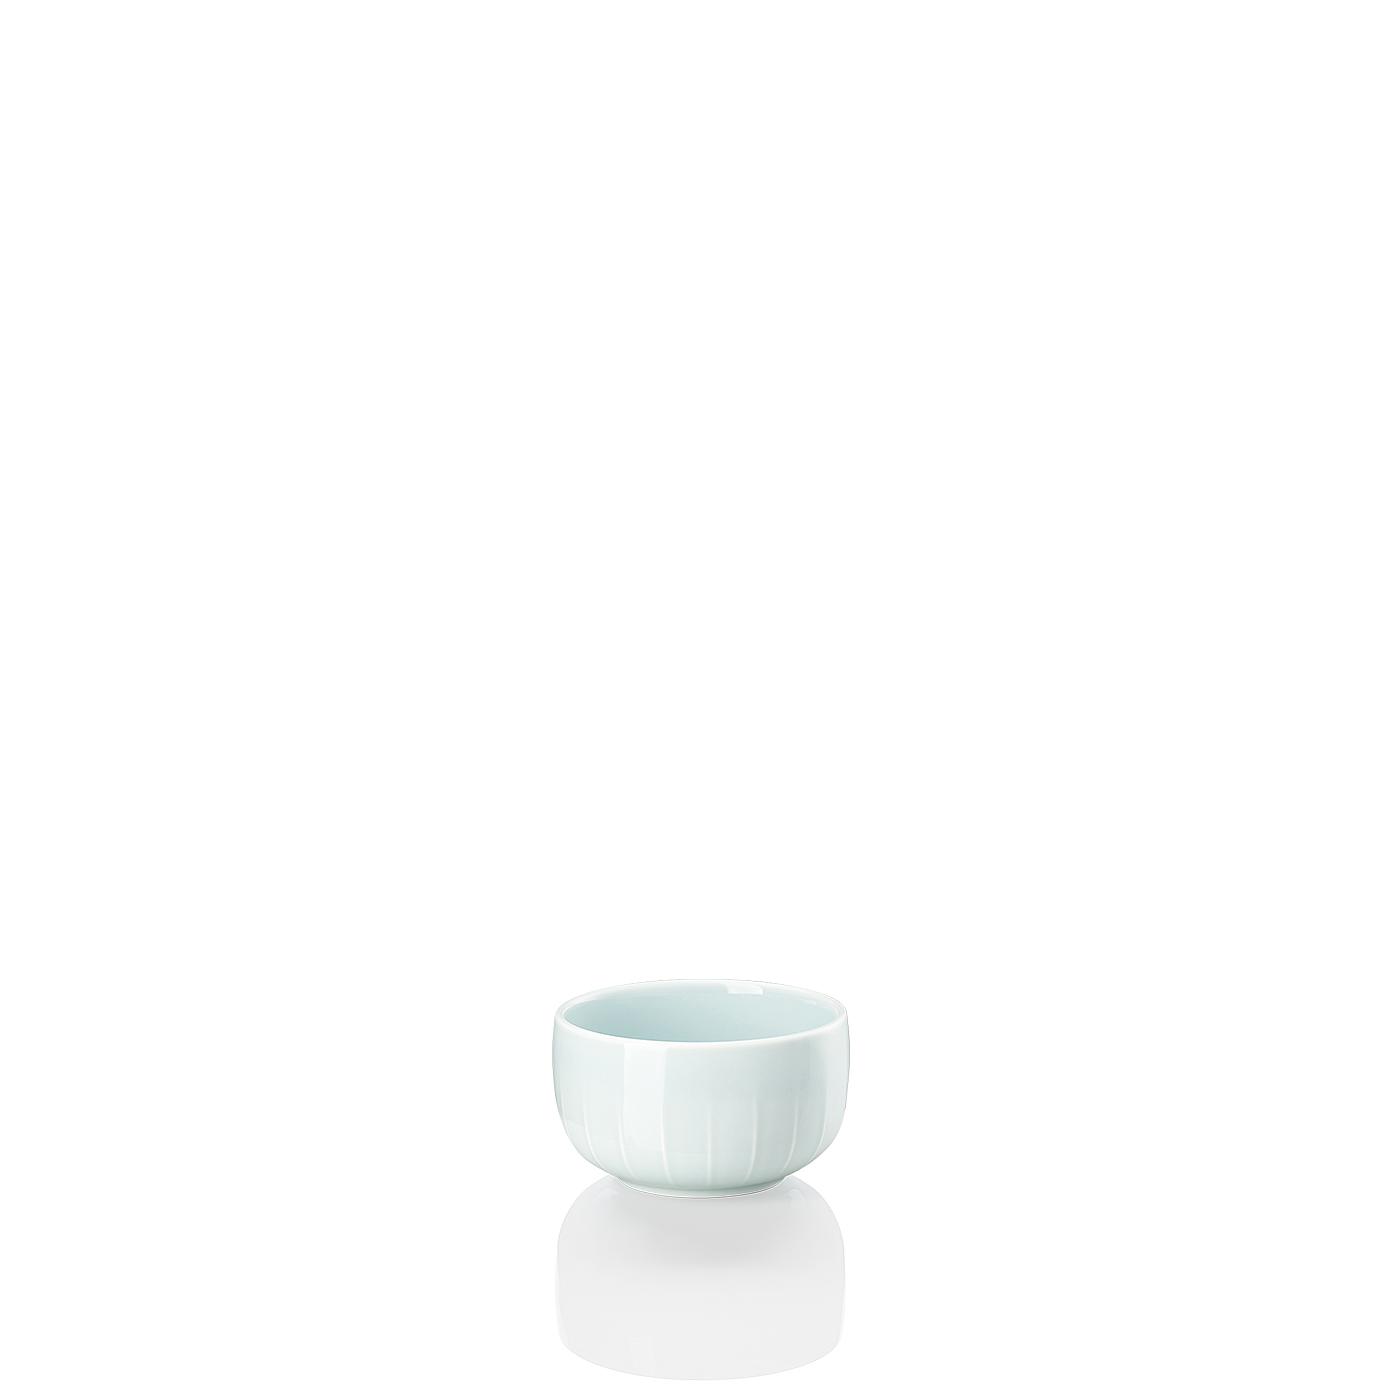 Dipschale 8 cm Joyn Mint Green Arzberg